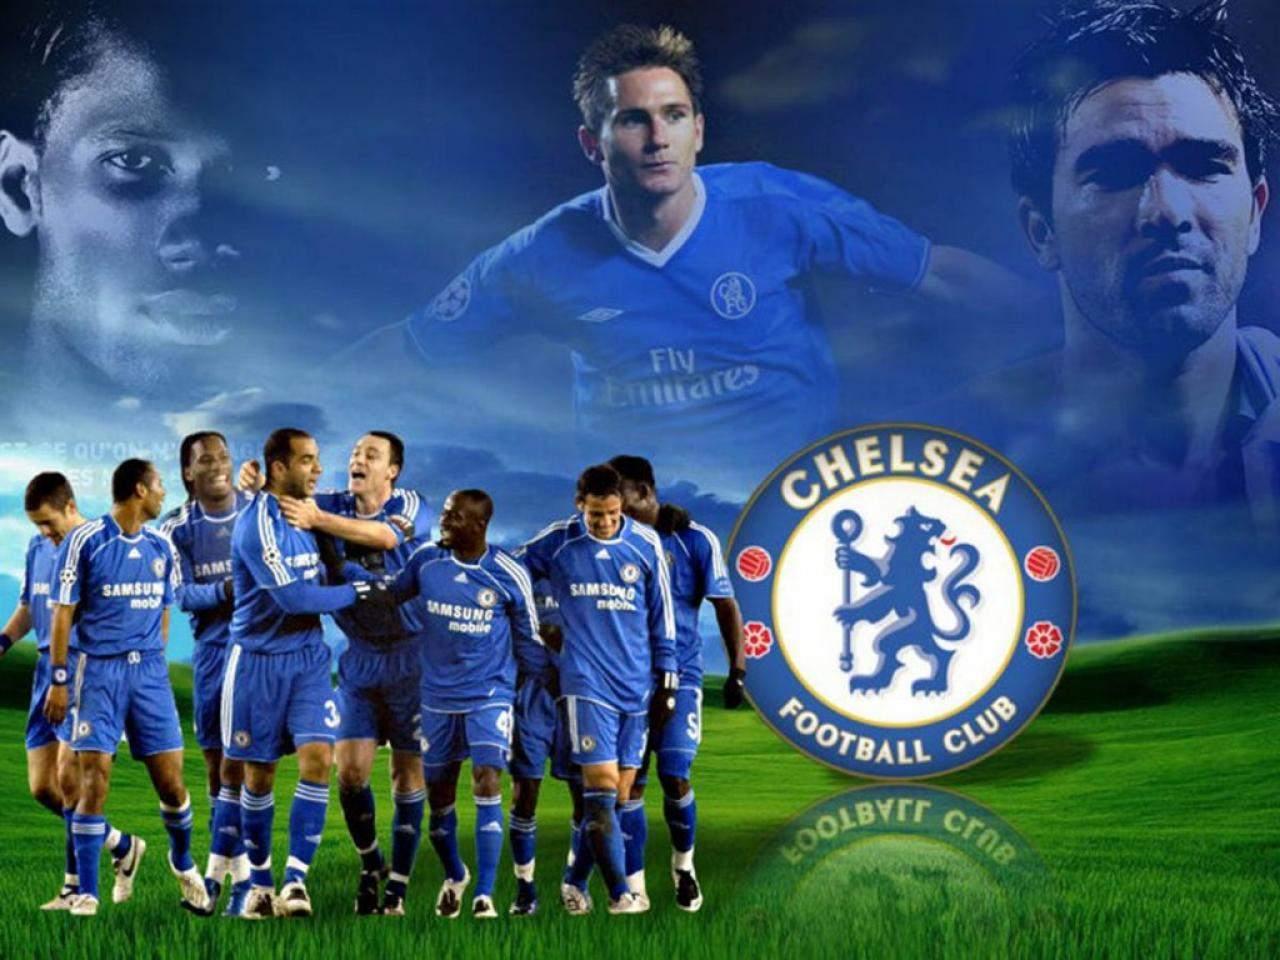 Chelsea Team Photo For Wallpaper HD